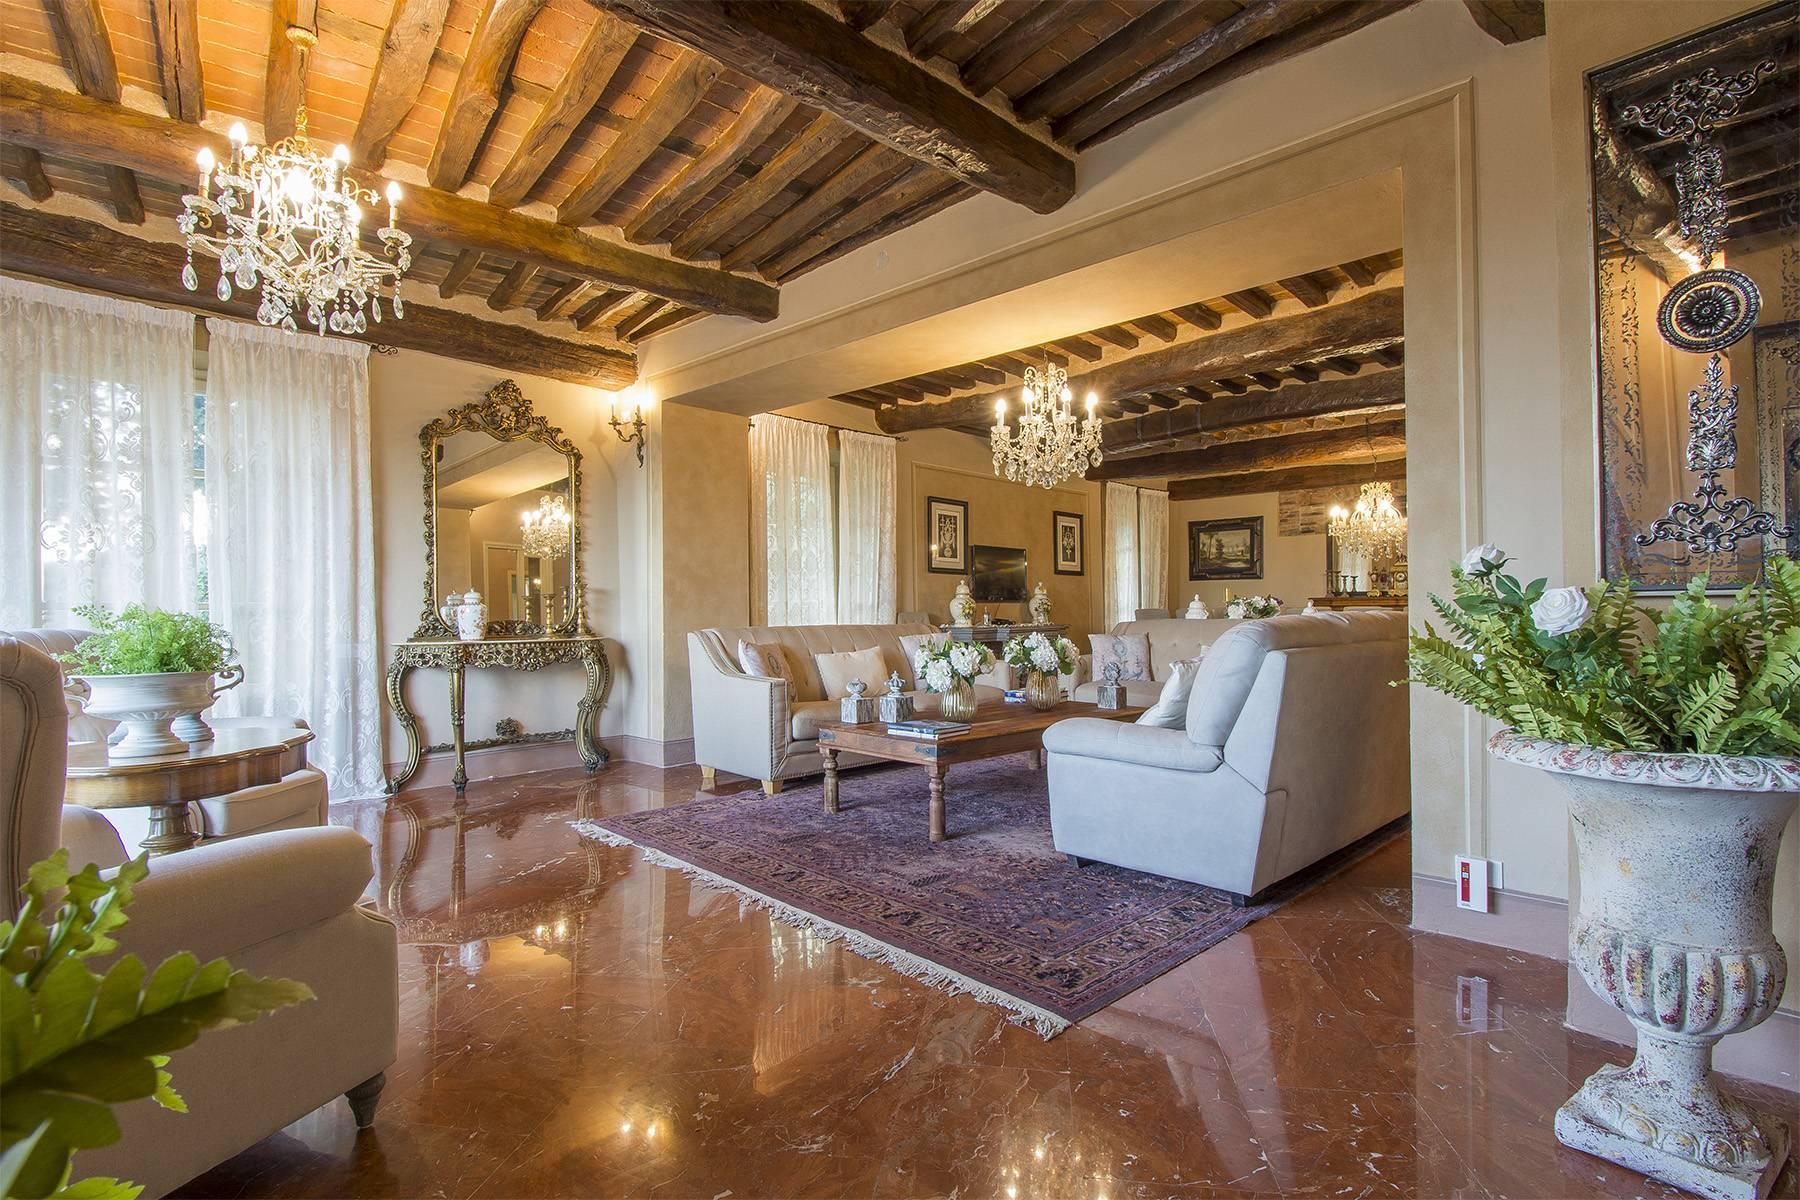 Romantic luxury Villa on the hills of Lucca - 13